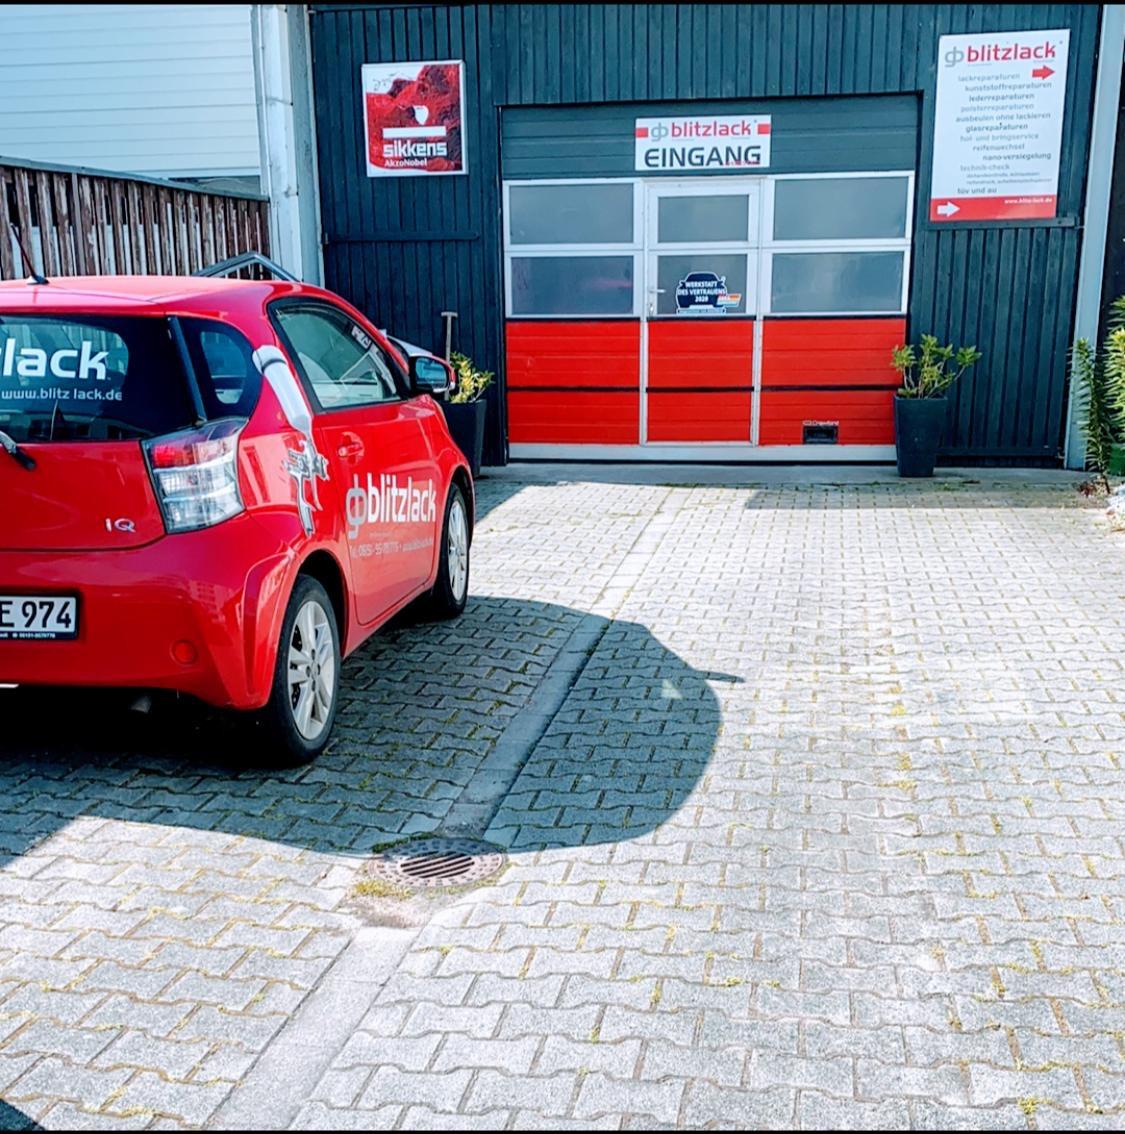 Unternehmen GB Blitzlack